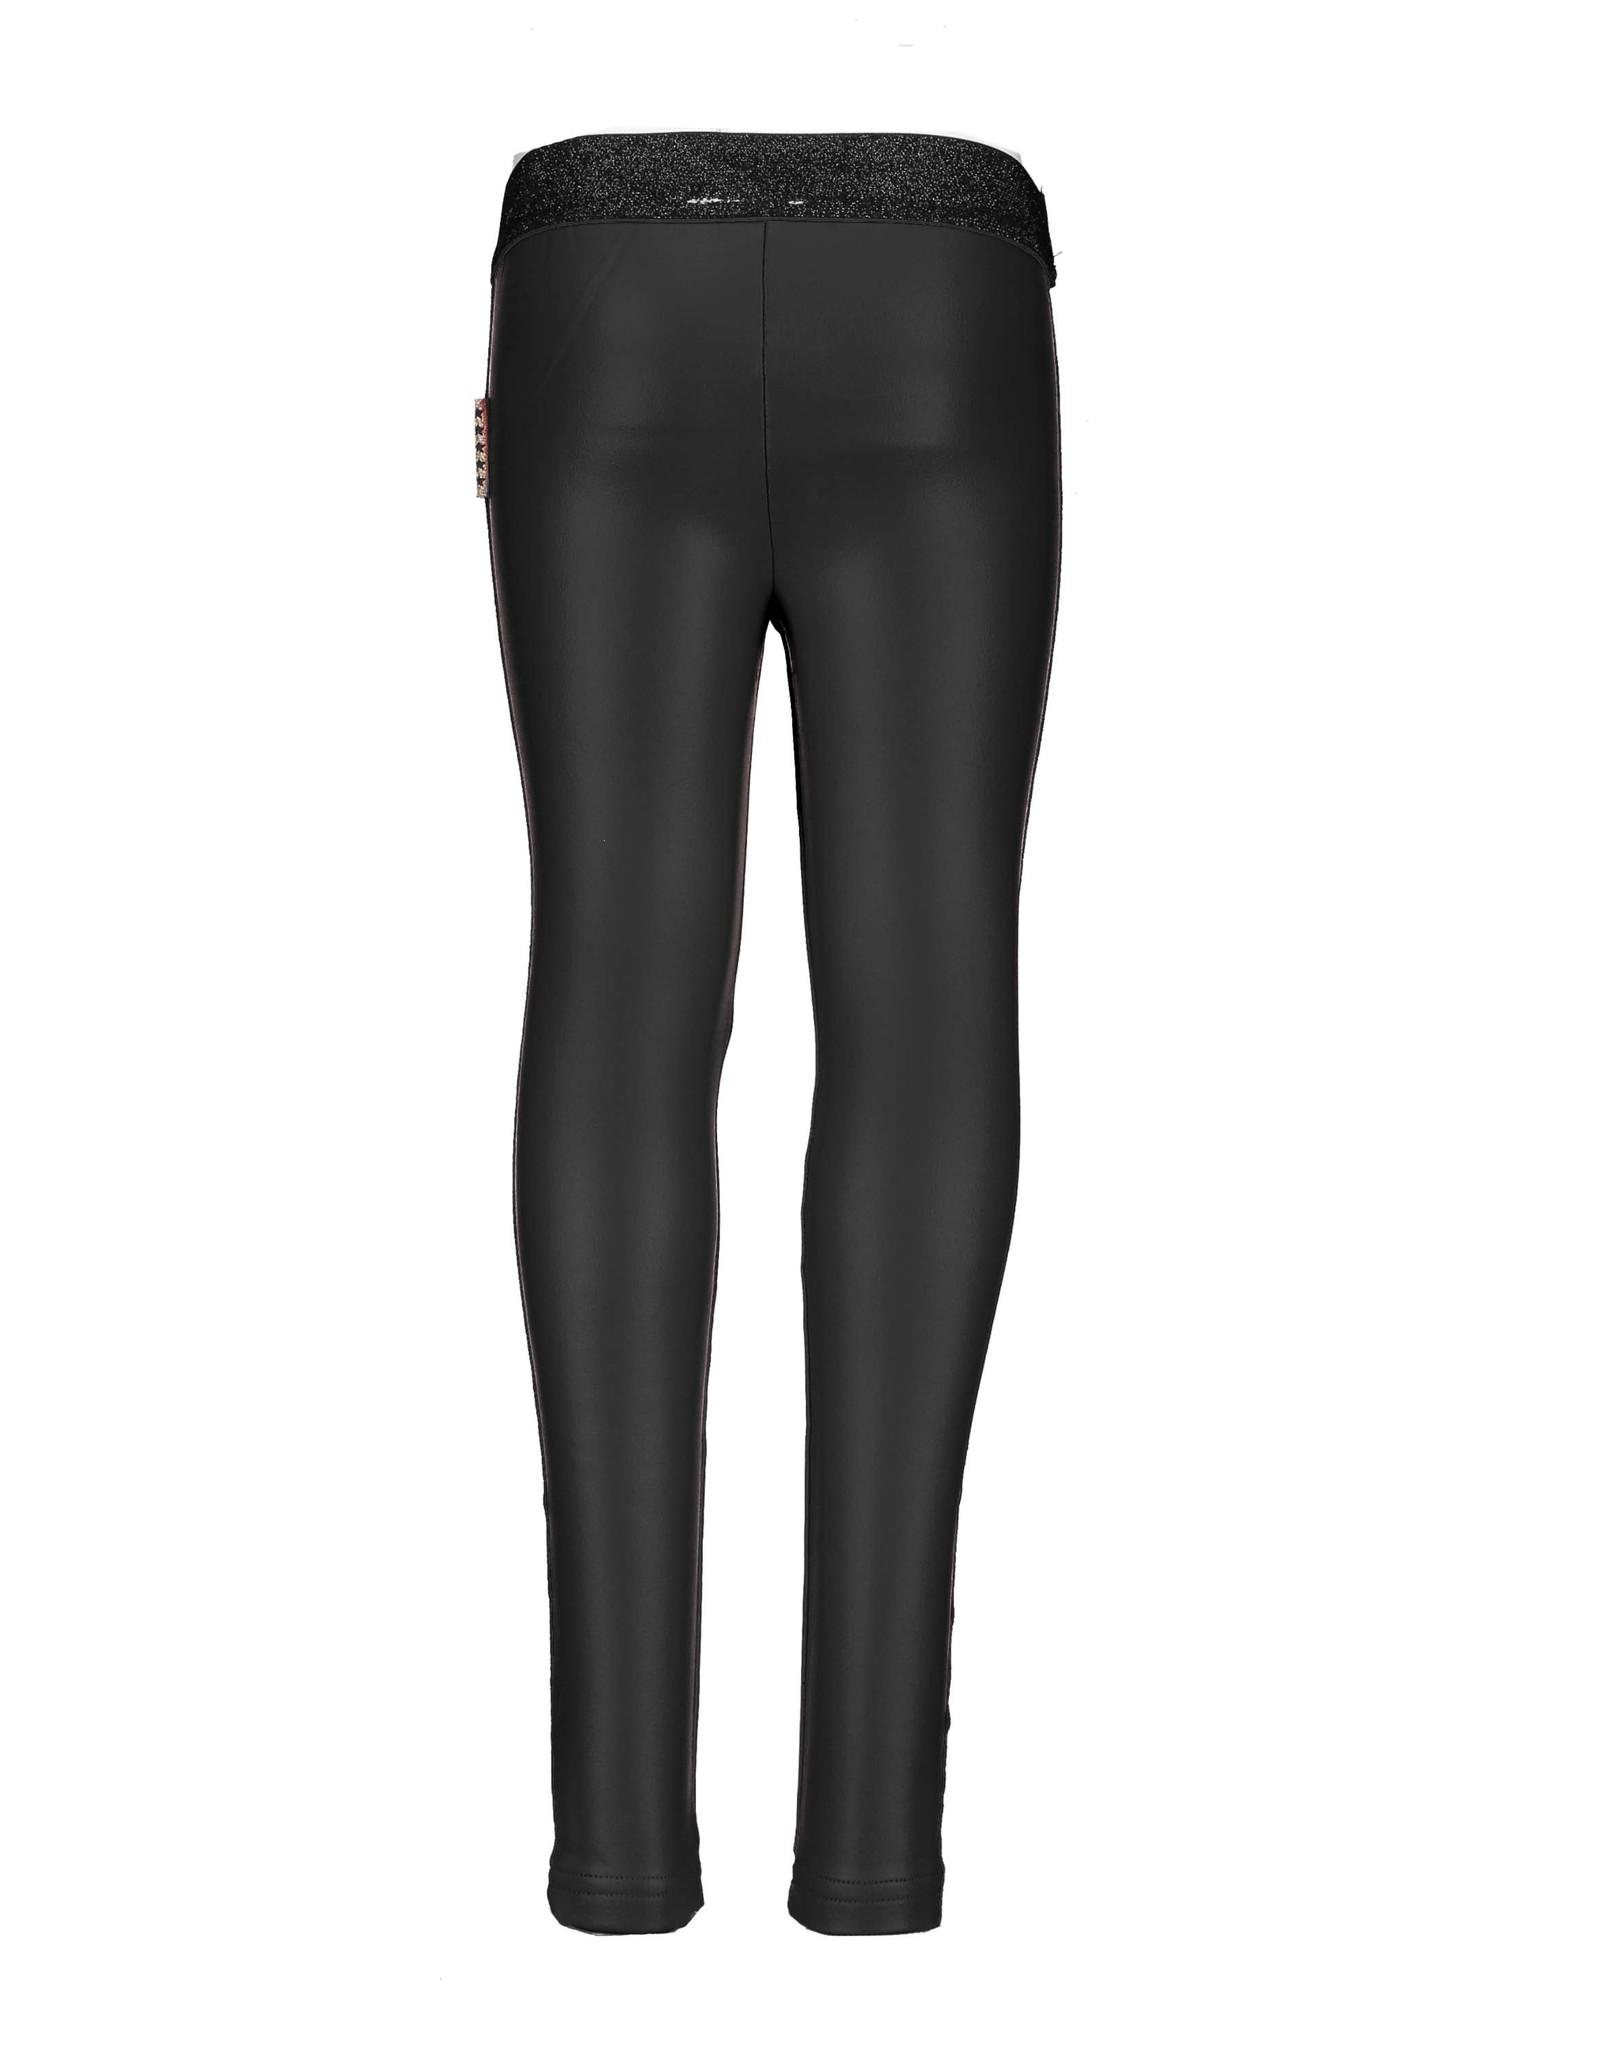 B.Nosy B.Nosy- Girls Legging Star Elastic-Black